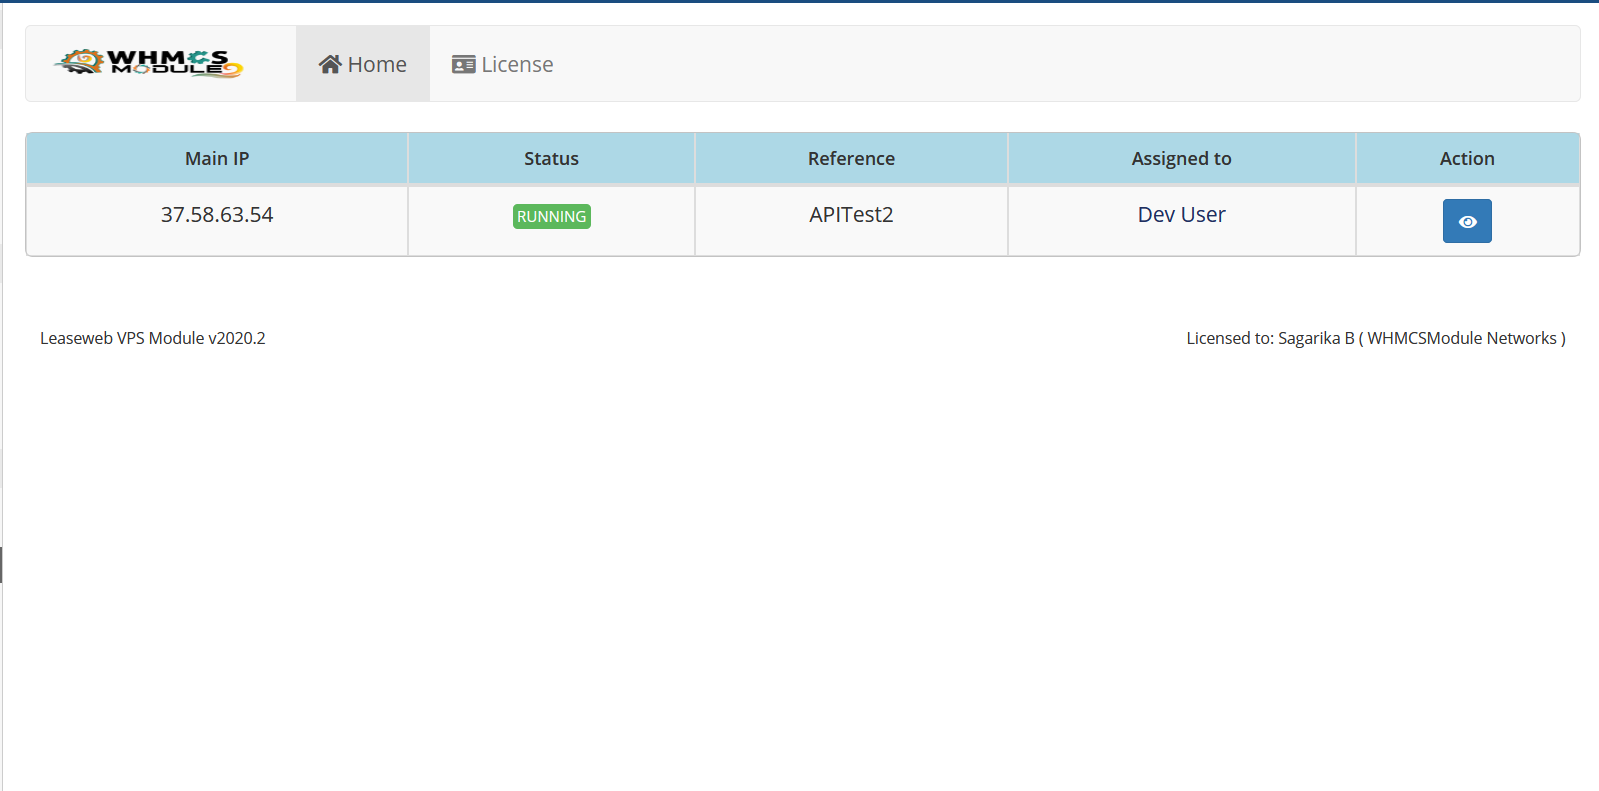 Leaseweb VPS WHMCS Module